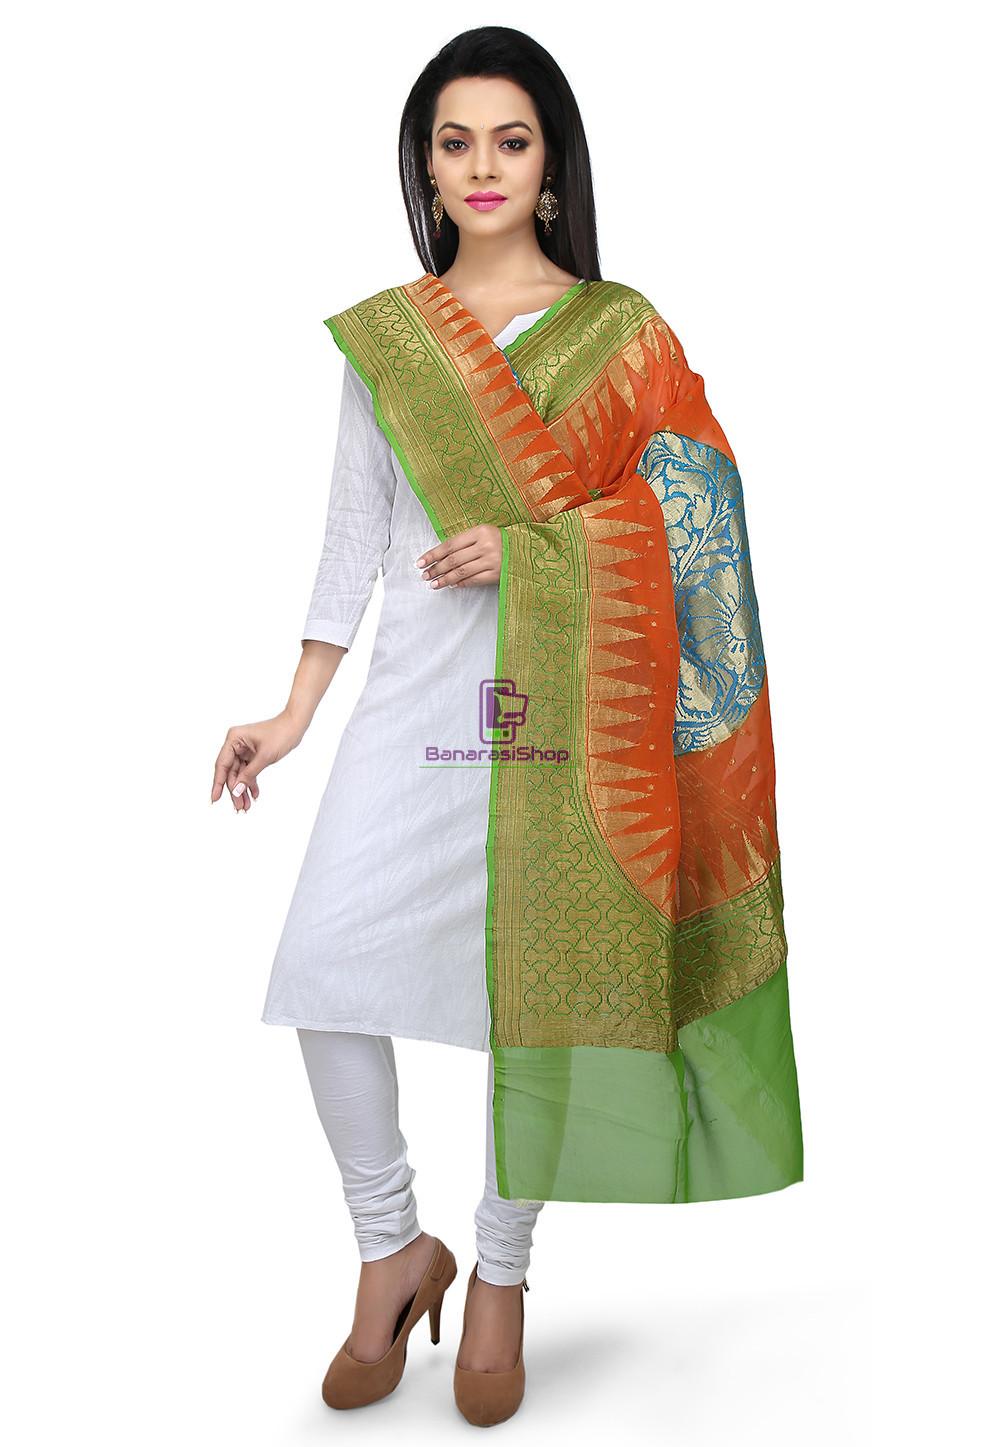 Handloom Banarasi Pure Georgette Dupatta in Orange and Green 1